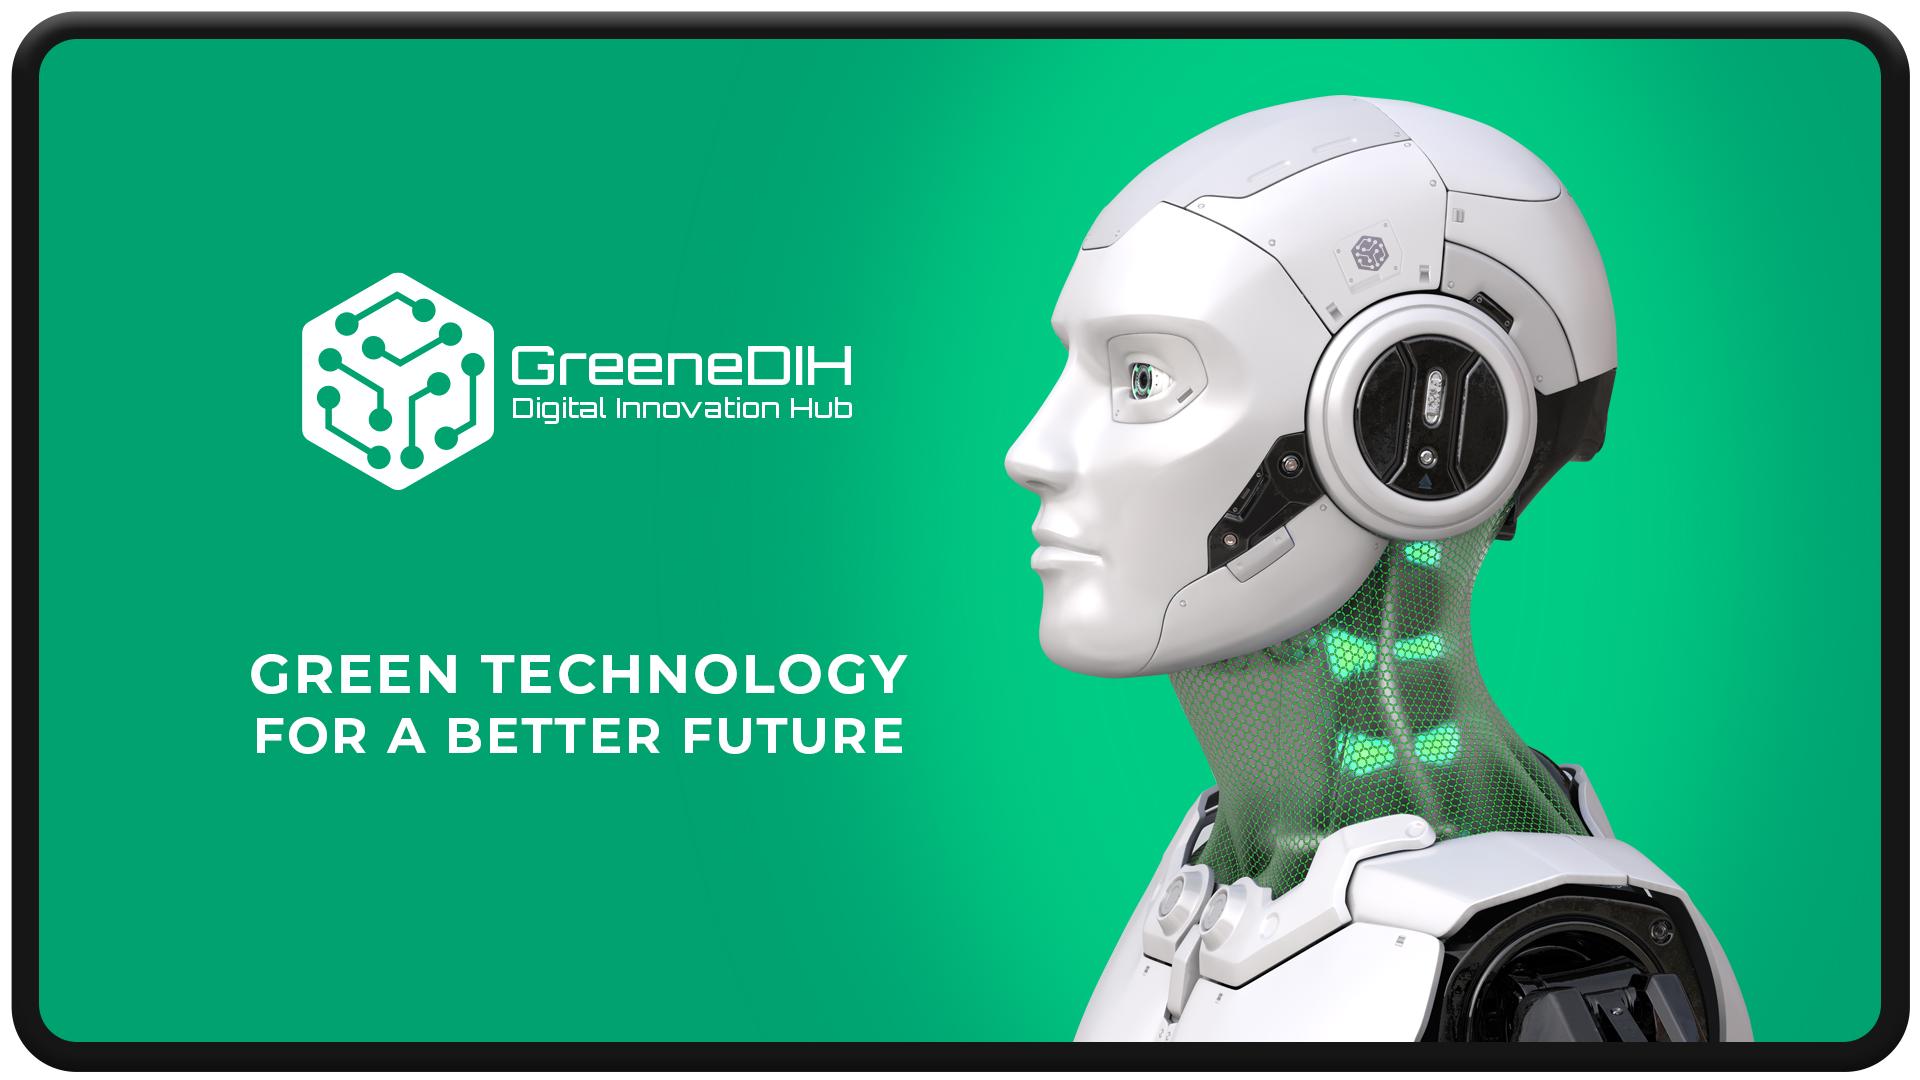 Green Digital Innovation HUB – singurul Hub 100% digital din regiunea București